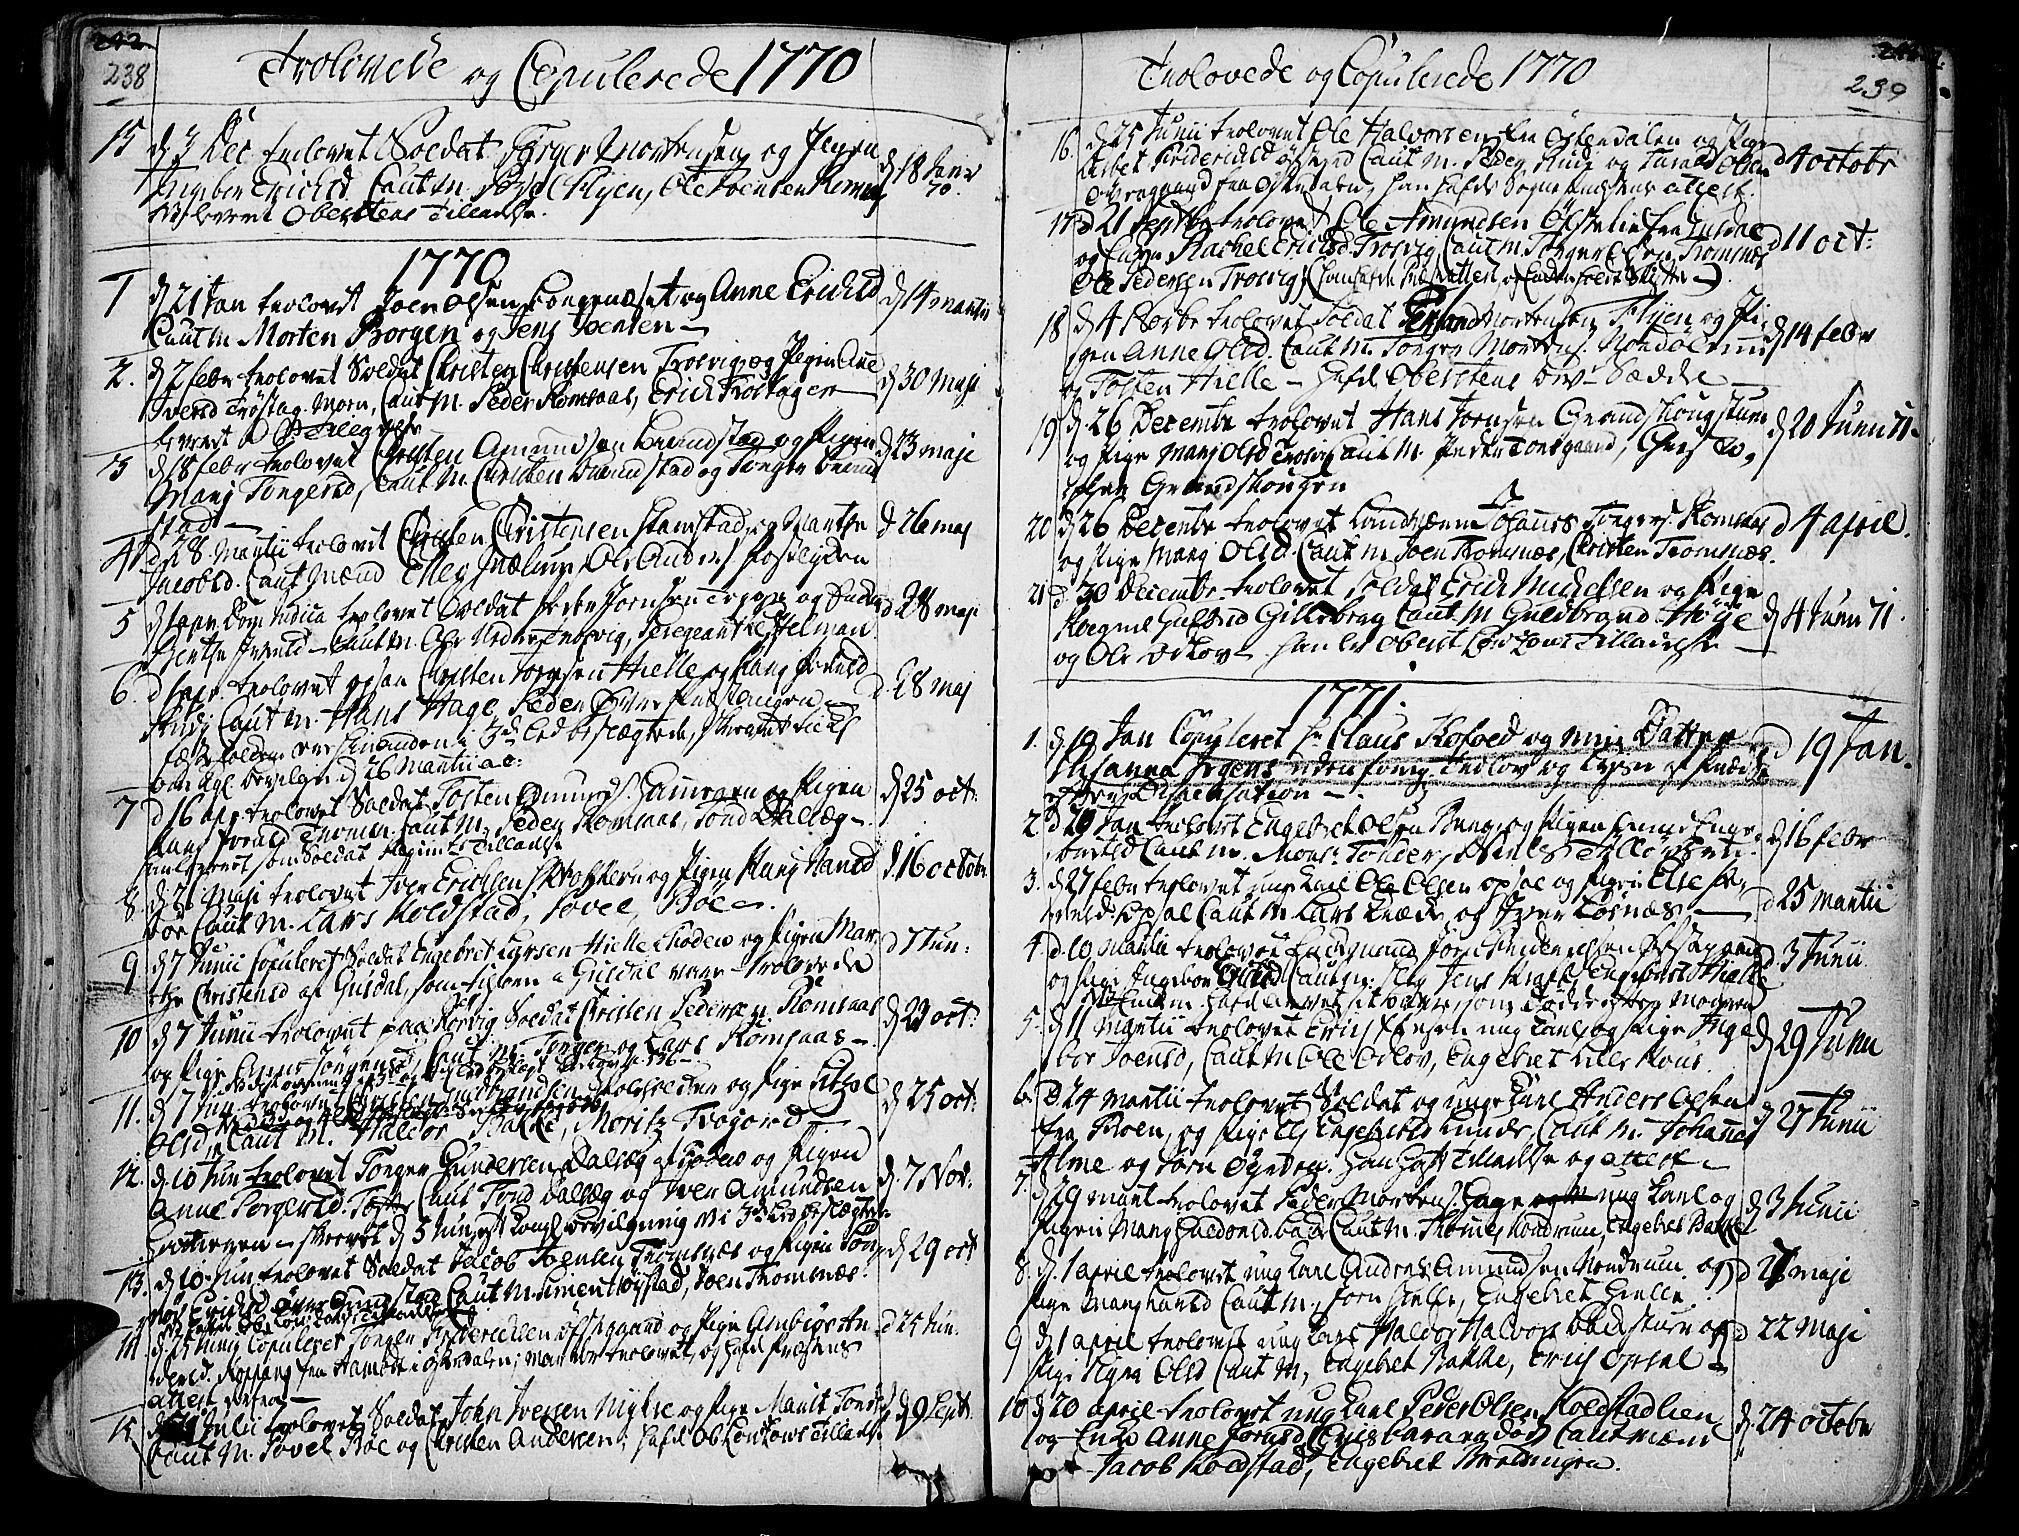 SAH, Ringebu prestekontor, Ministerialbok nr. 2, 1734-1780, s. 238-239